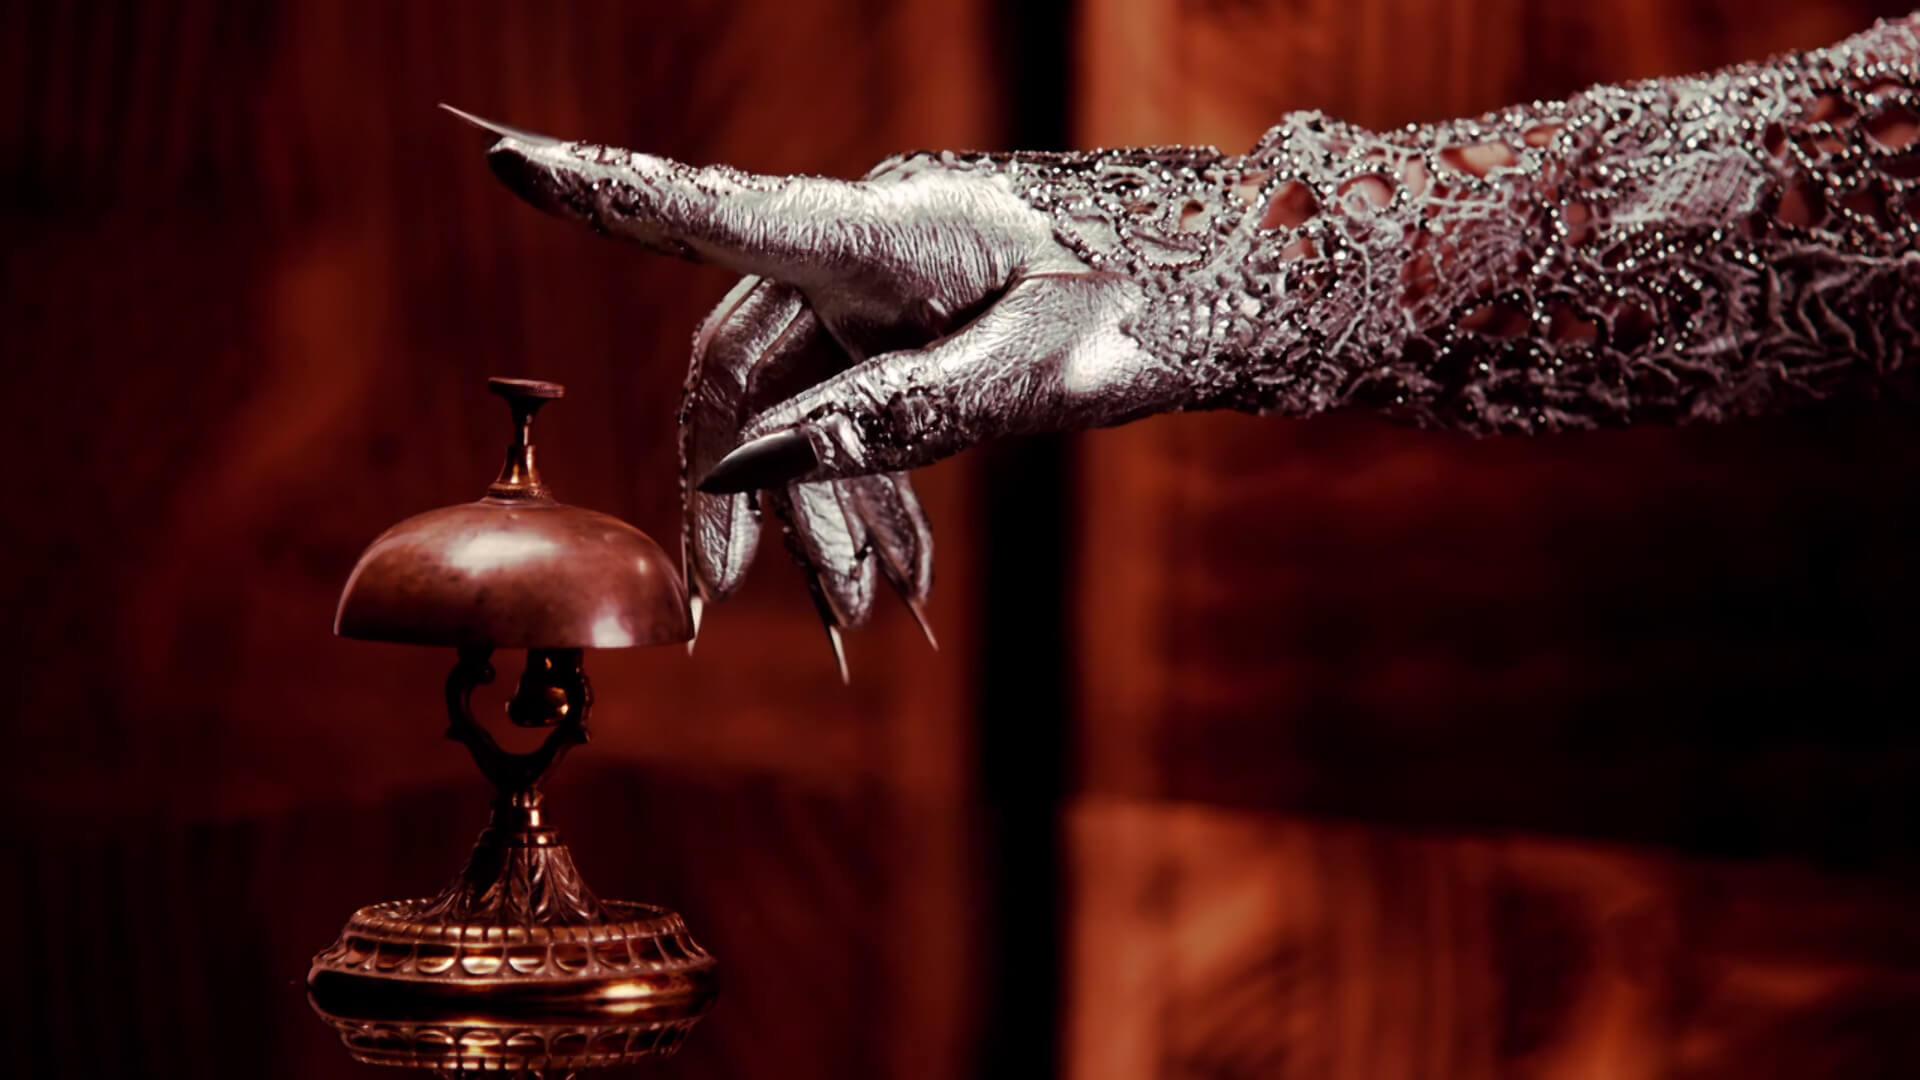 American Horror Story: Hotel TV Series Teaser Wallpaper